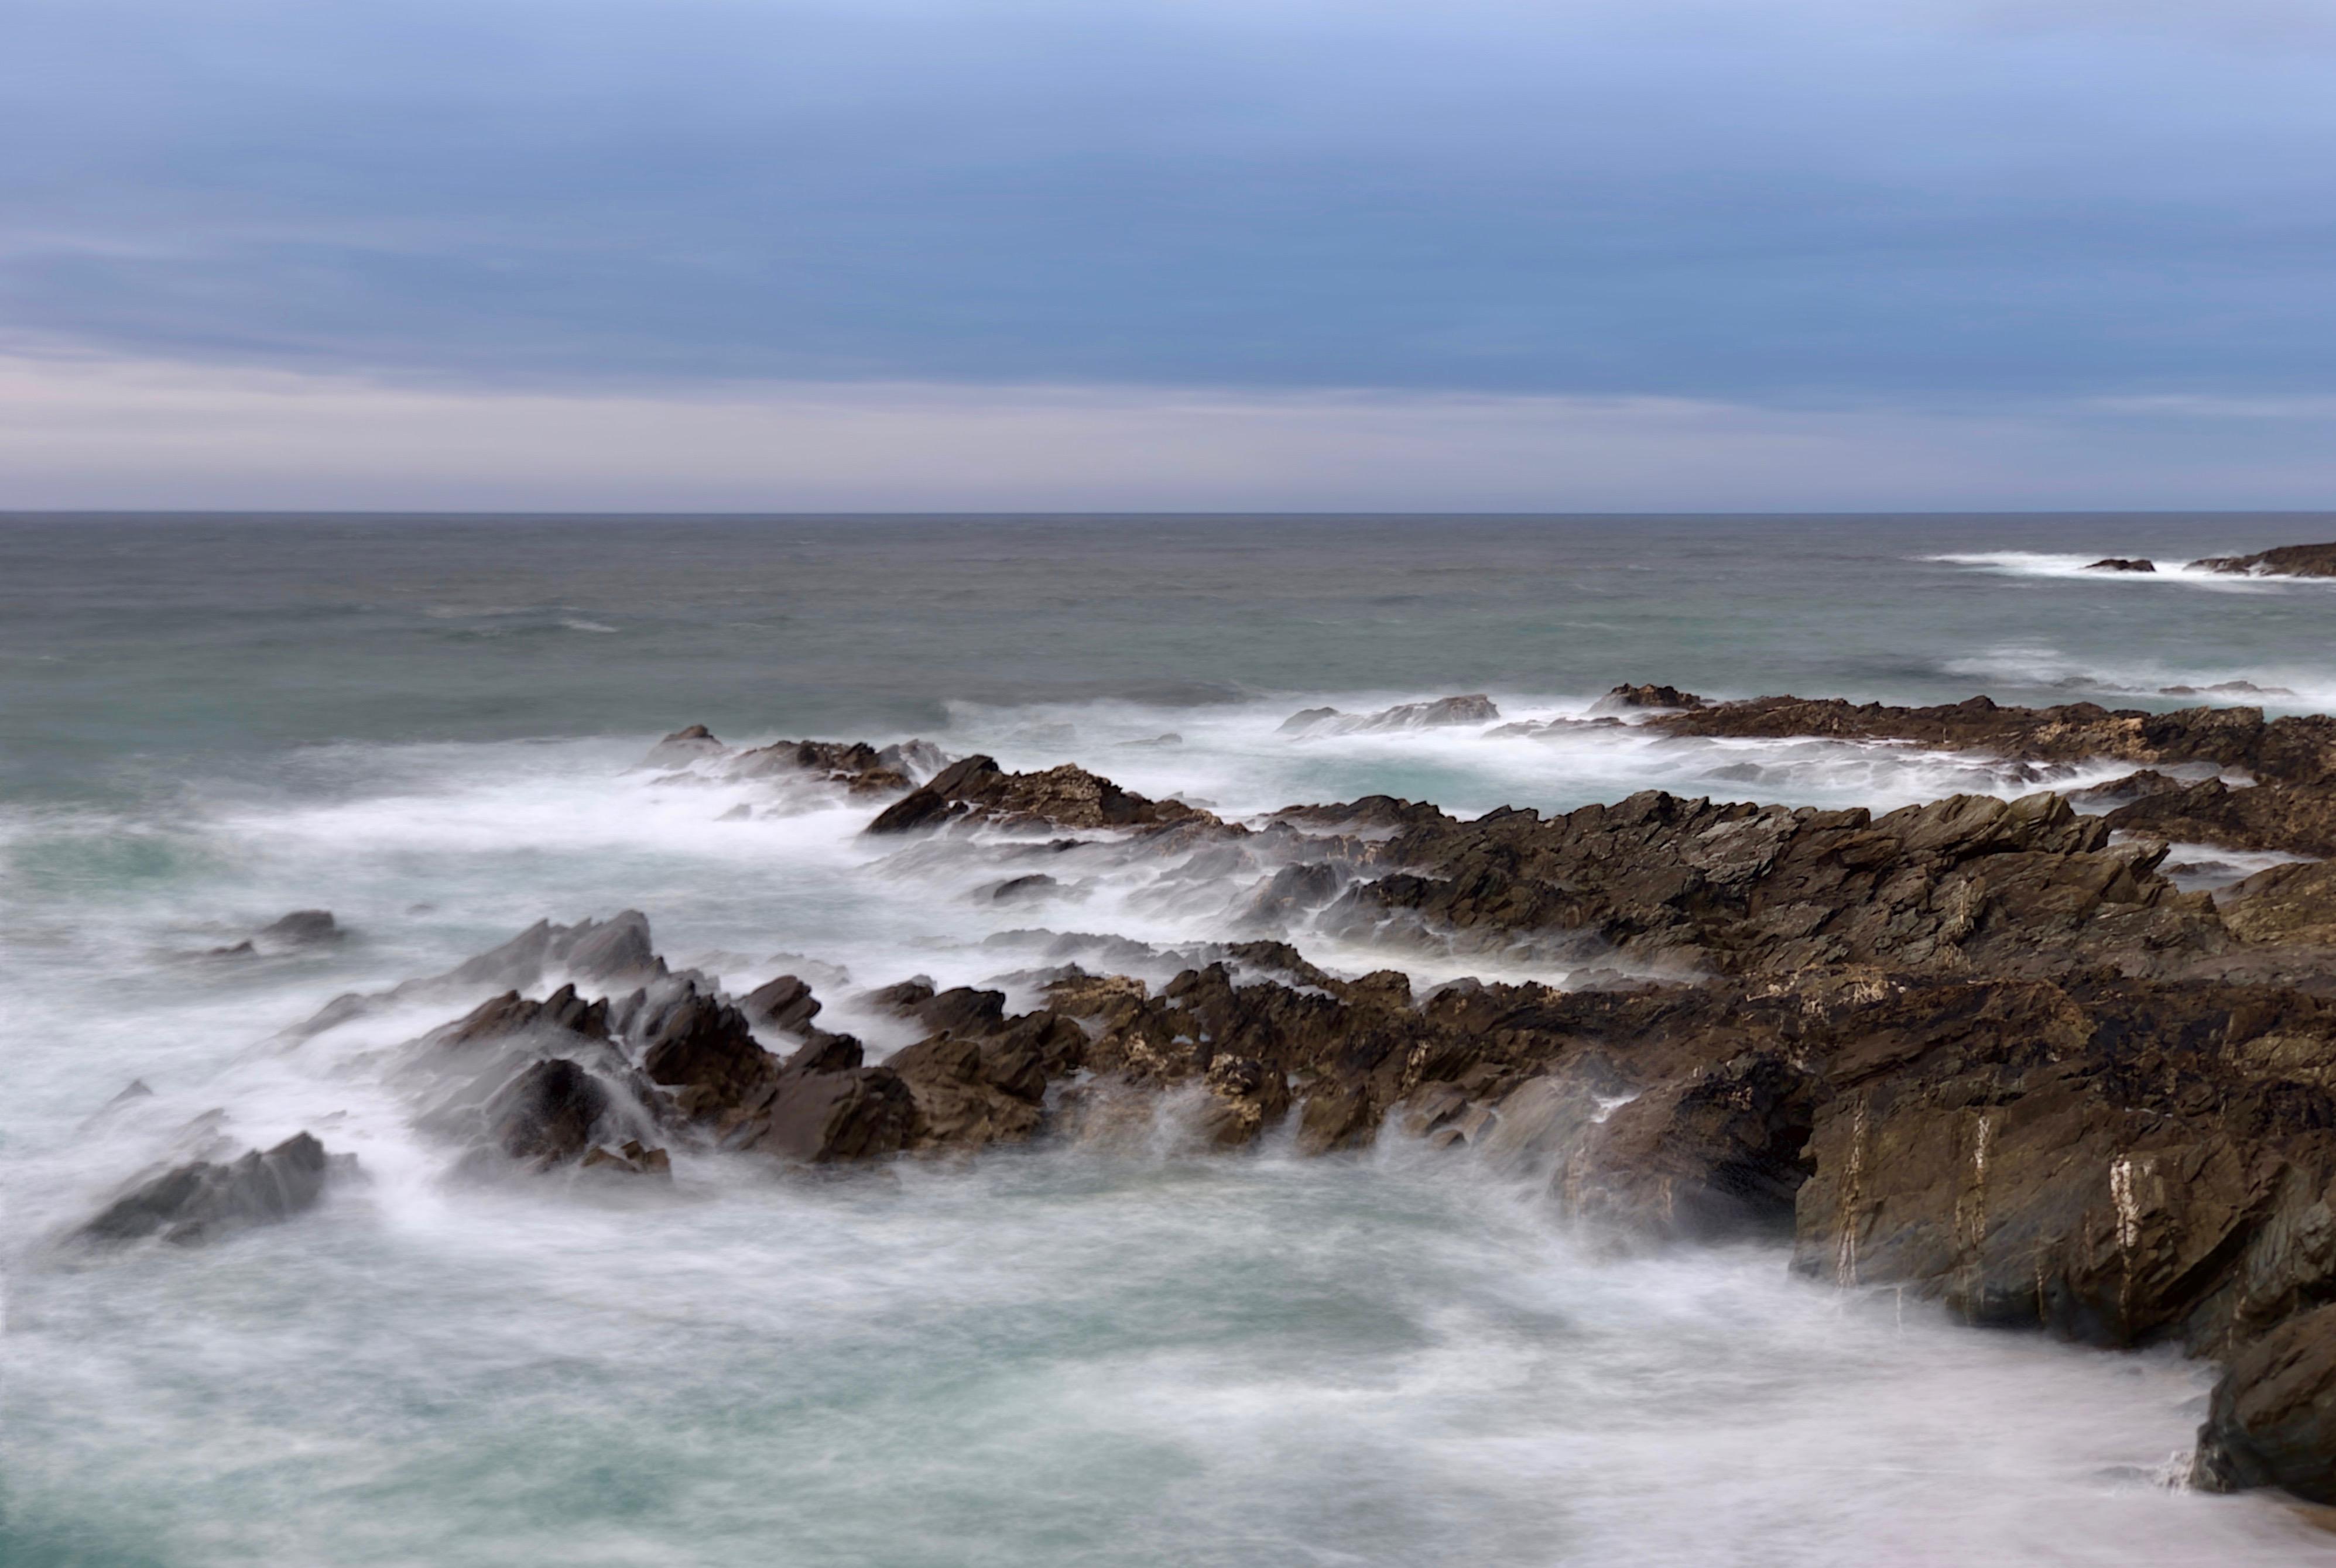 Newquay rocks